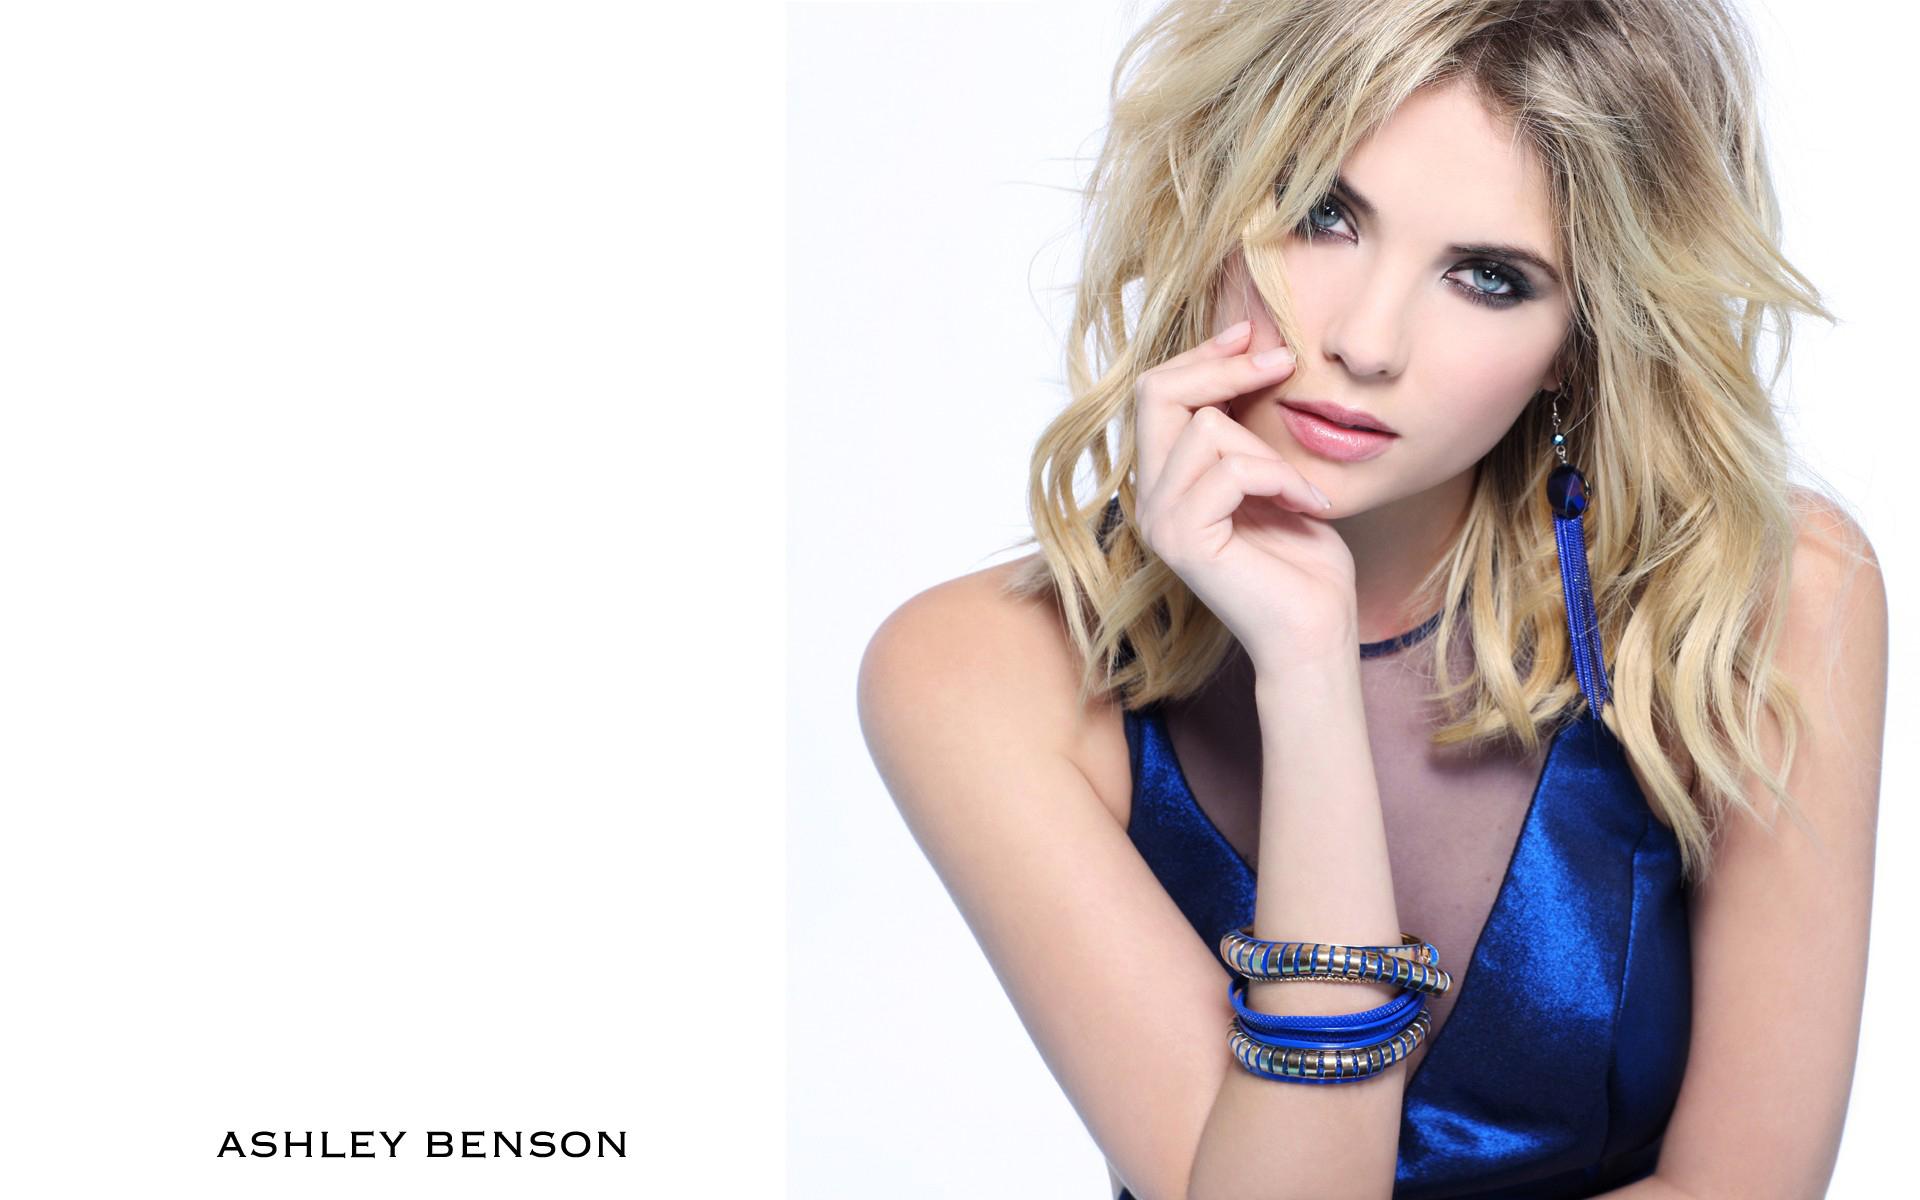 Ashley benson hd